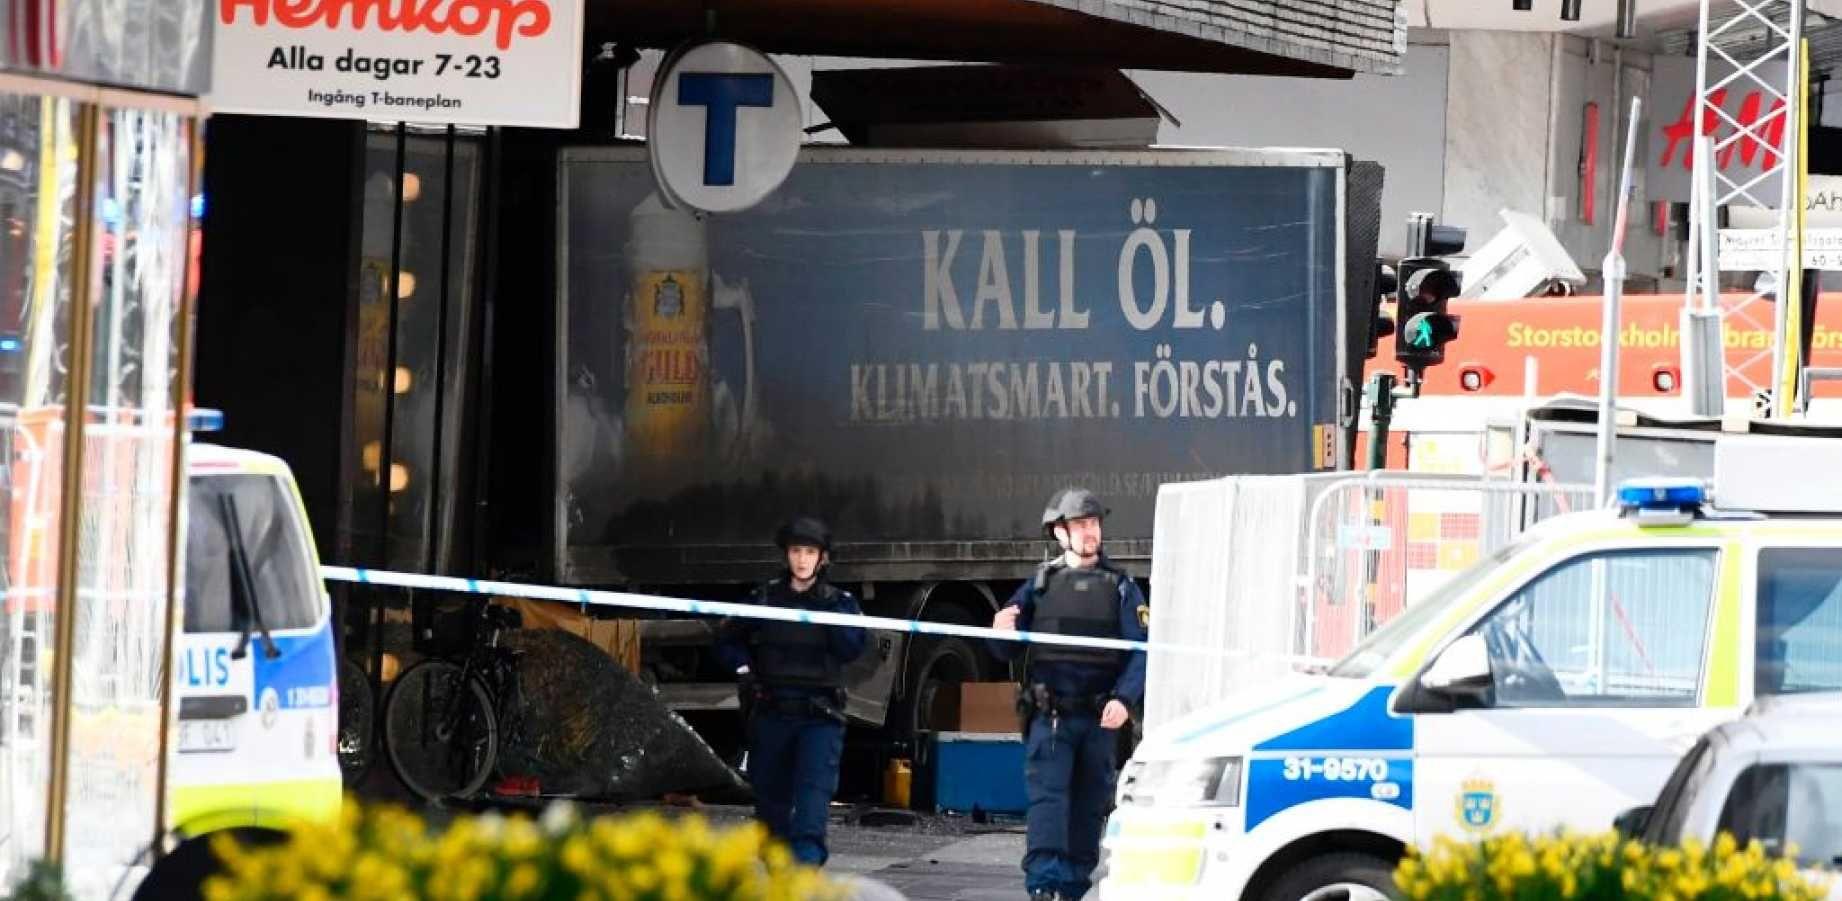 BREAKING Terror Truck Attack In Stockholm, Sweden? (With